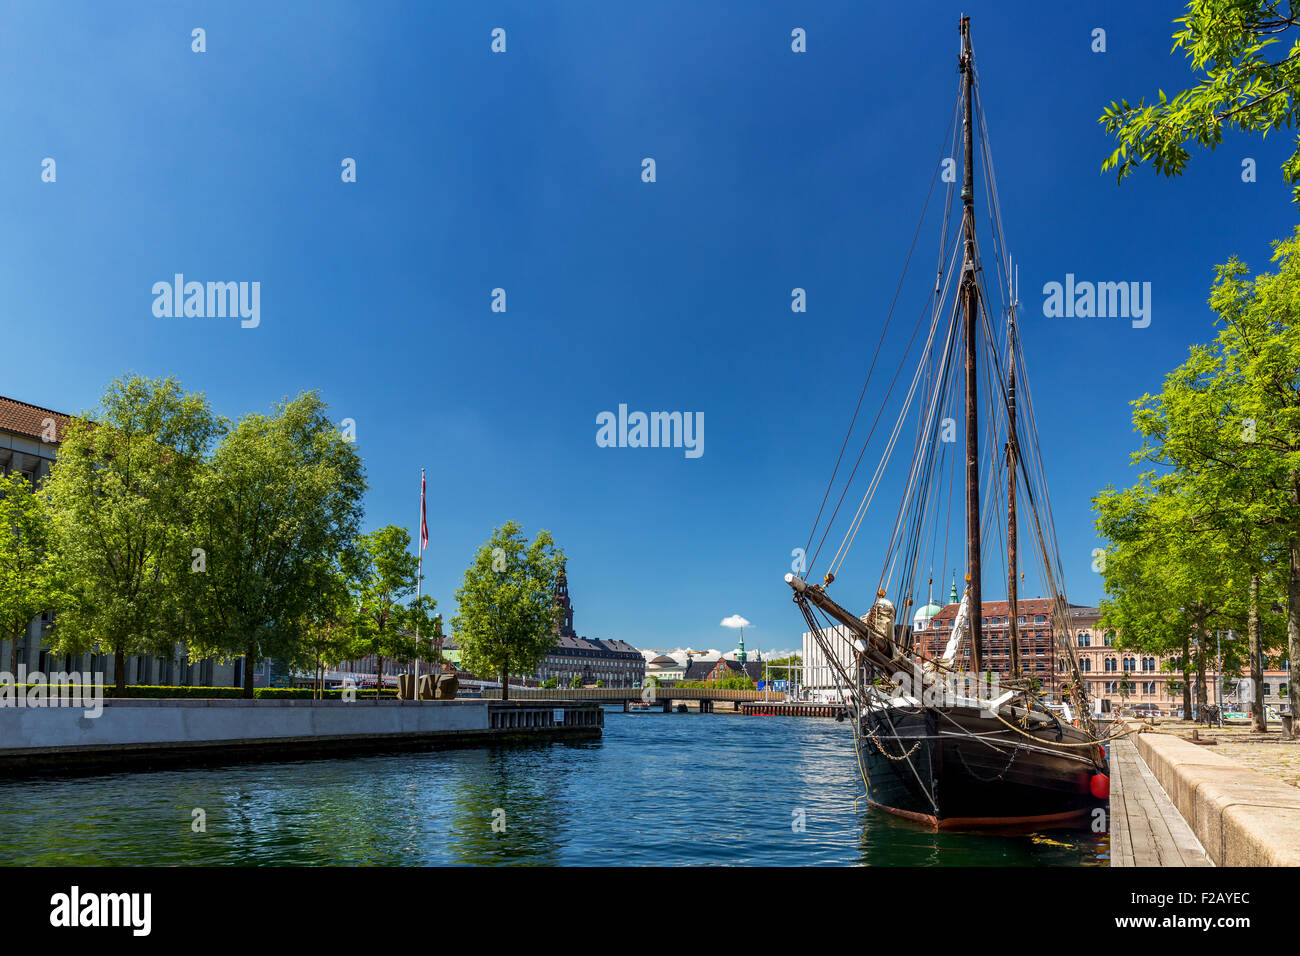 An old wooden ship near Eigtveds Pakhus, Conference center, Copenhagen, Denmark - Stock Image